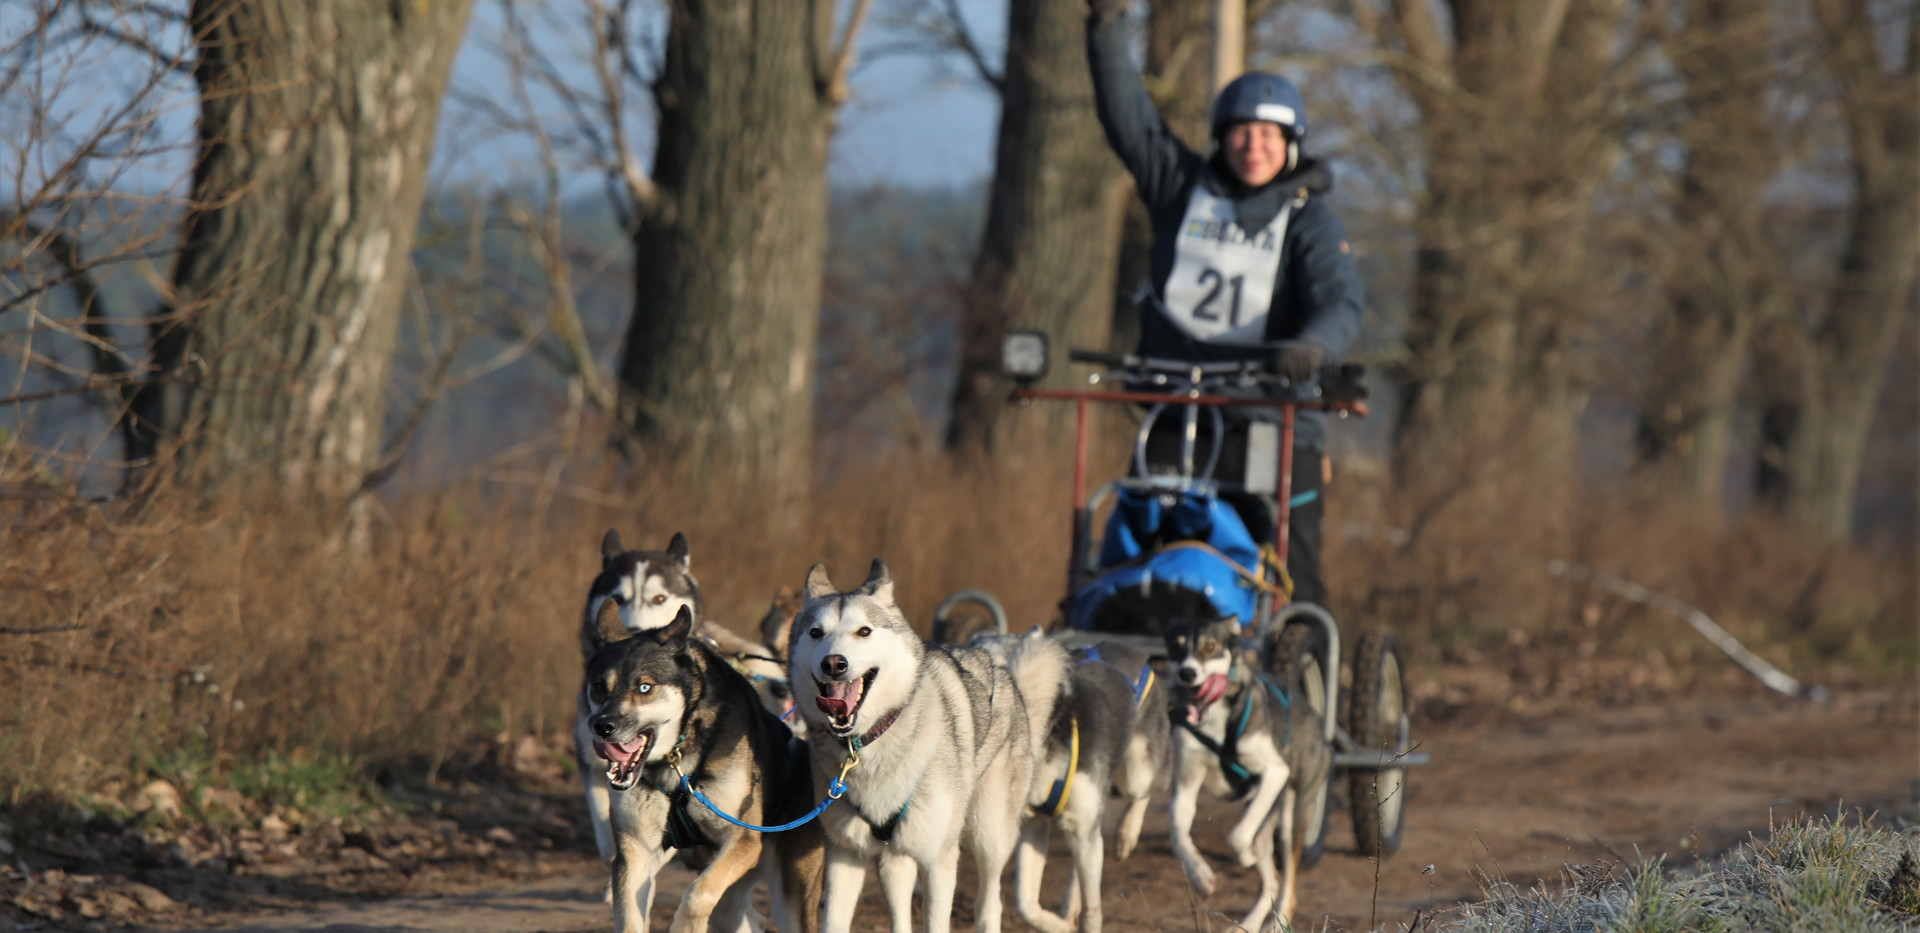 dog-paparazzi_Dog Paparazzi - Klaistow 2